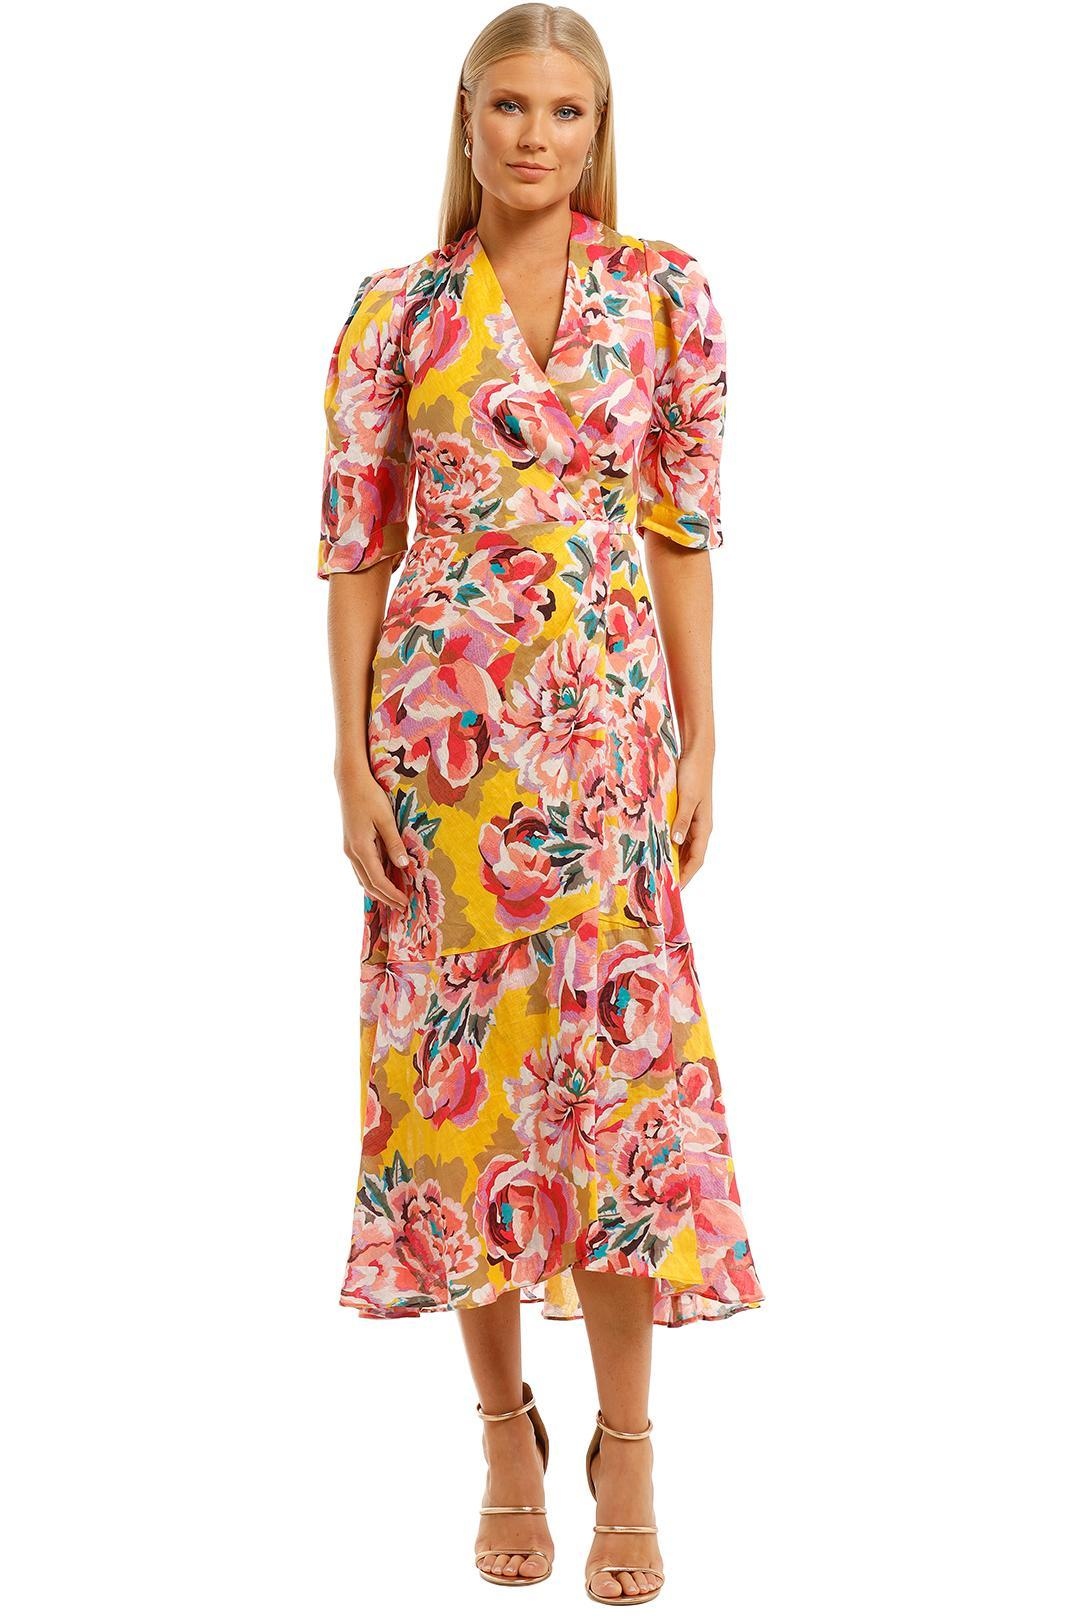 Ginger And Smart - Flourish Wrap Dress - Yellow